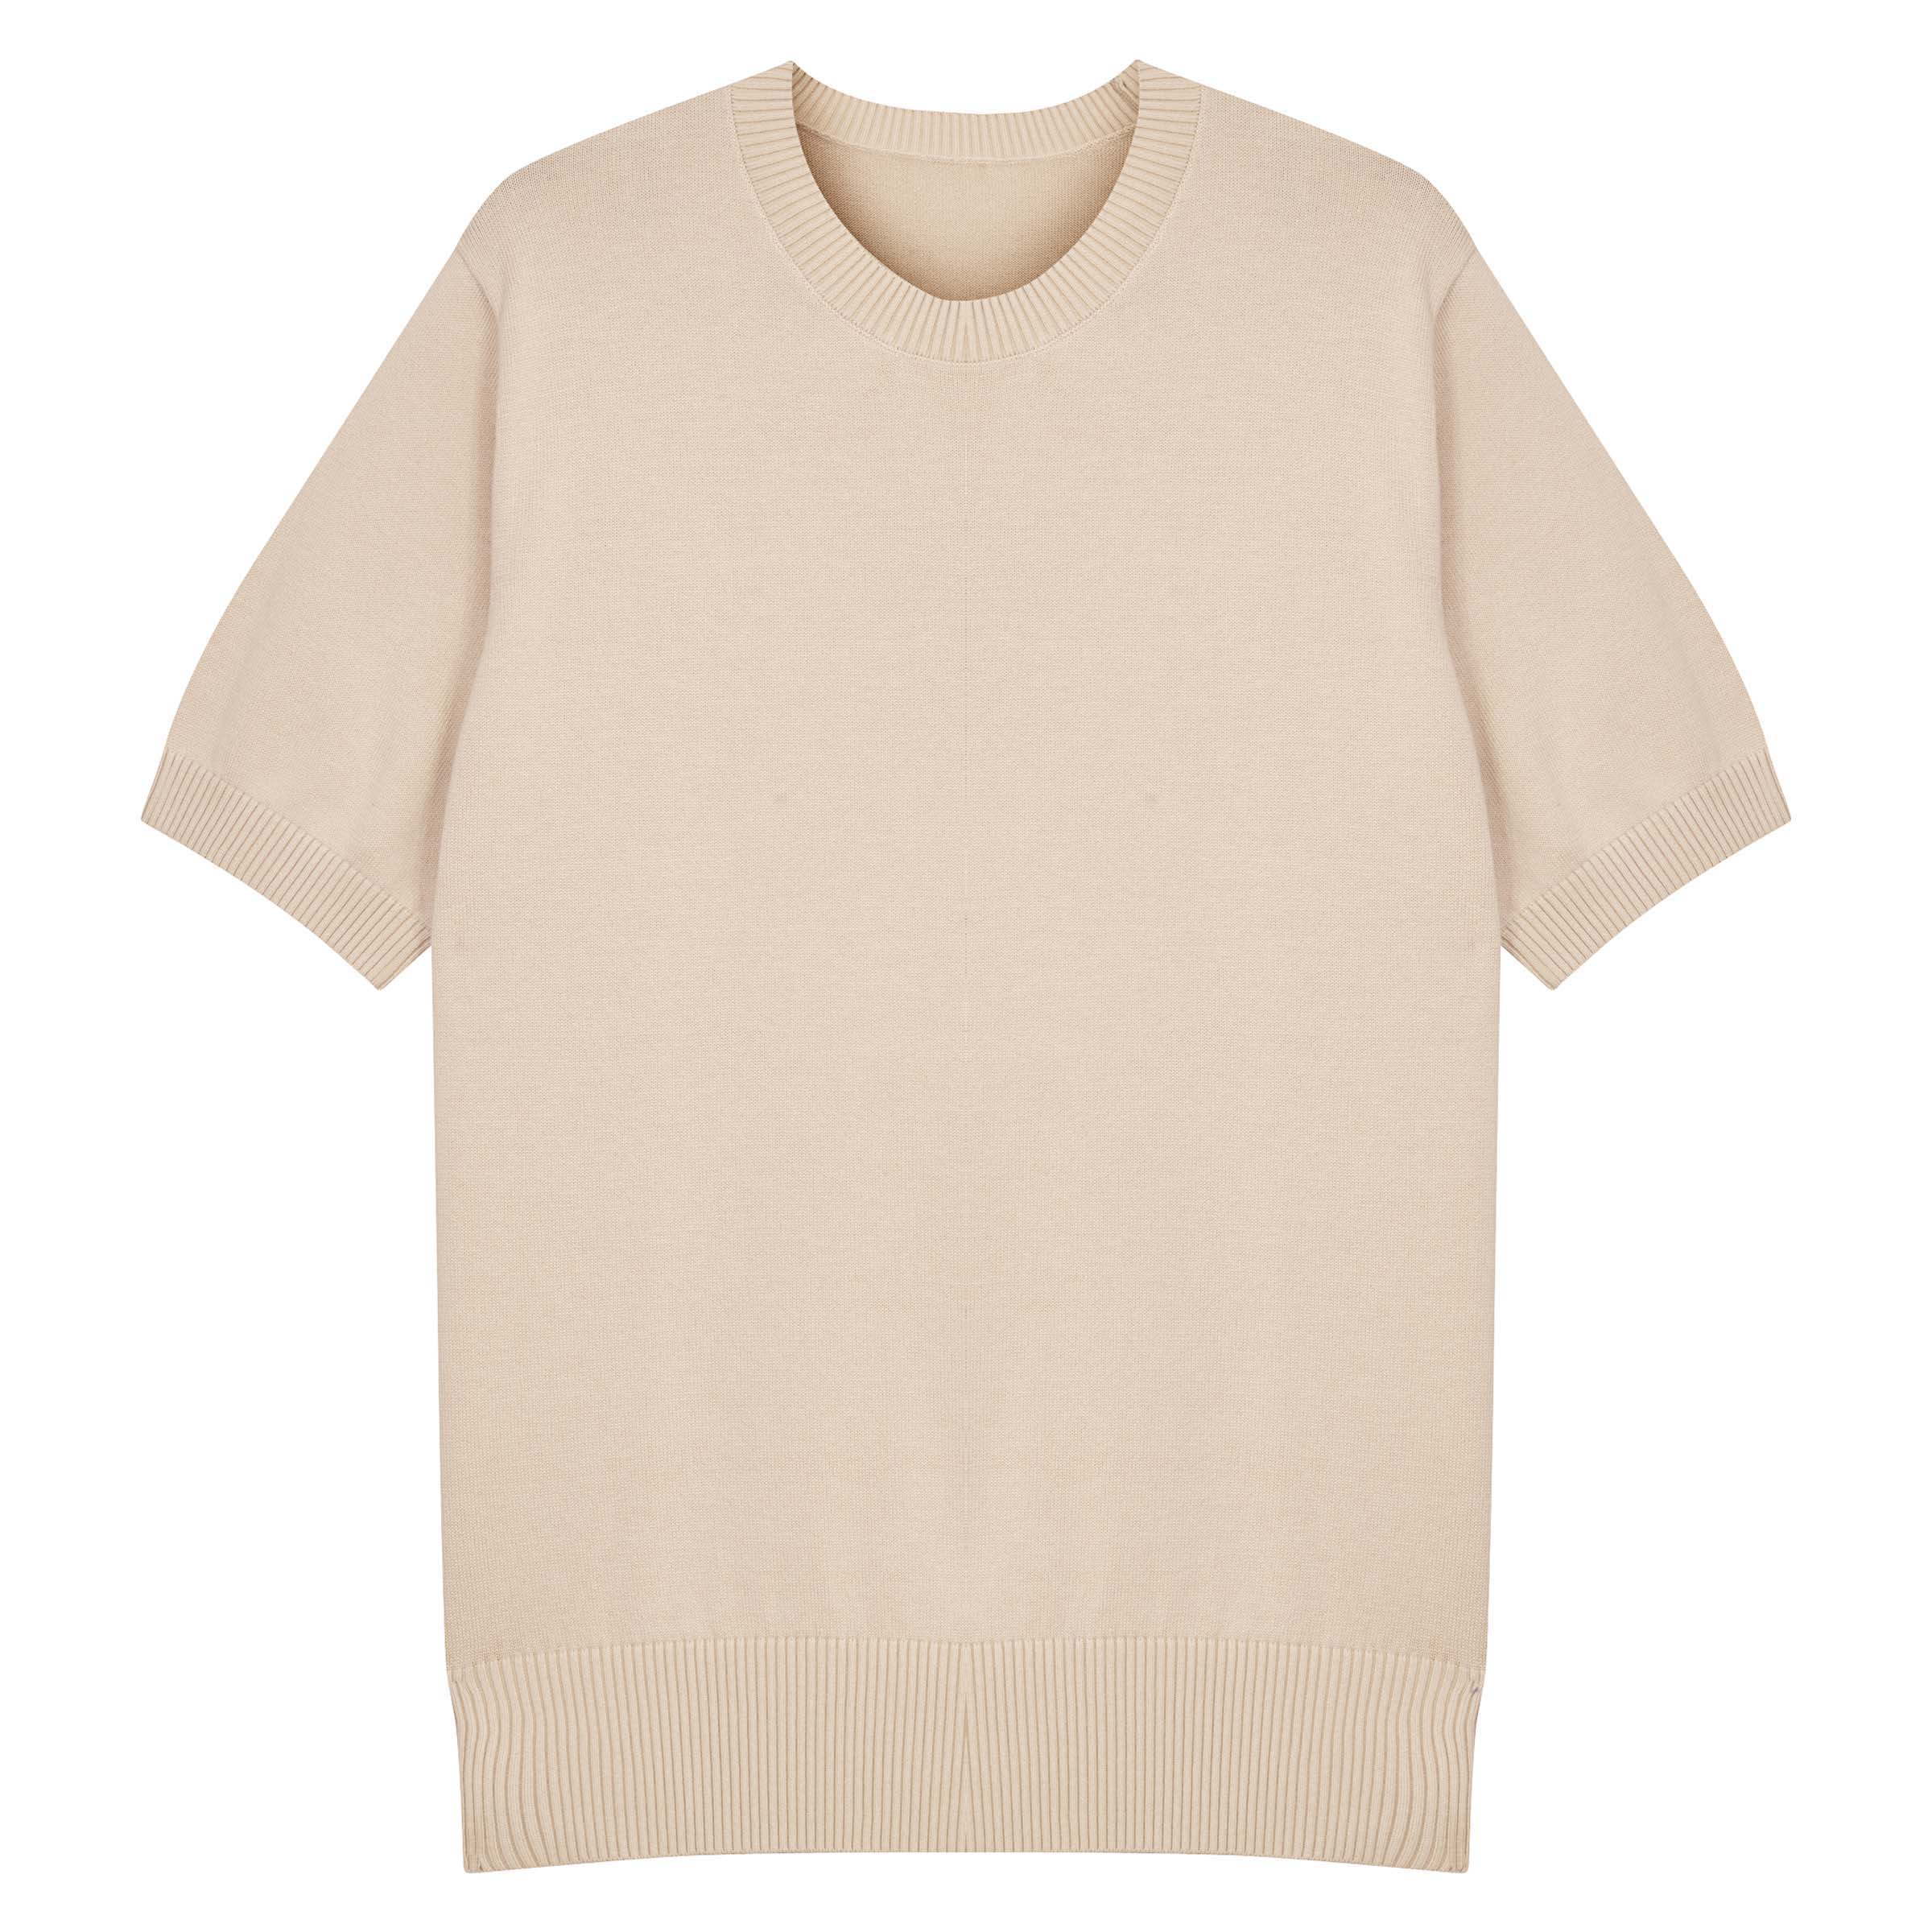 Ecru Knitted Supima Cotton T-Shirt